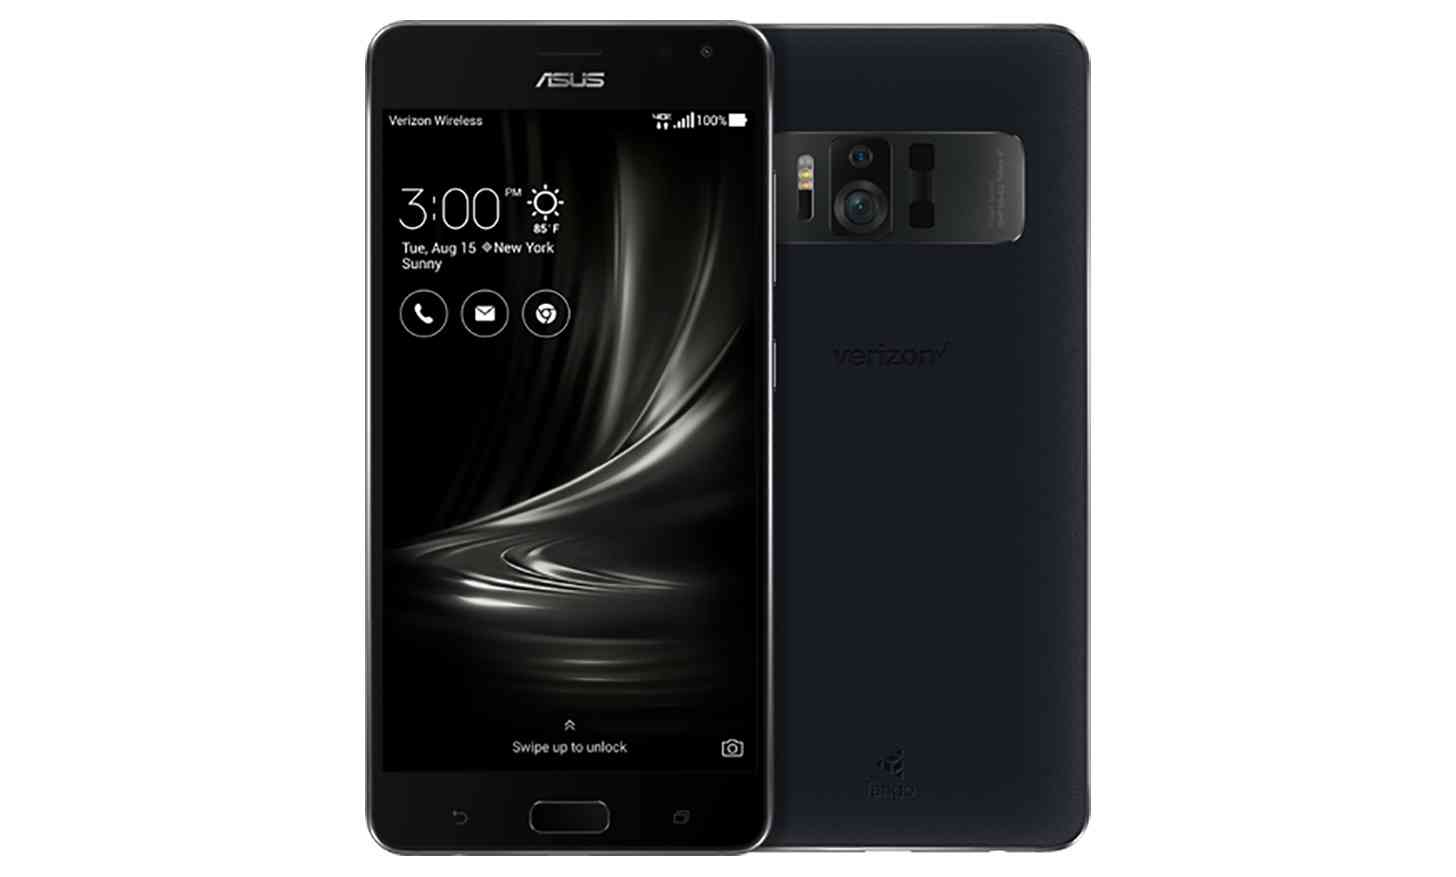 ASUS ZenFone AR Verizon official